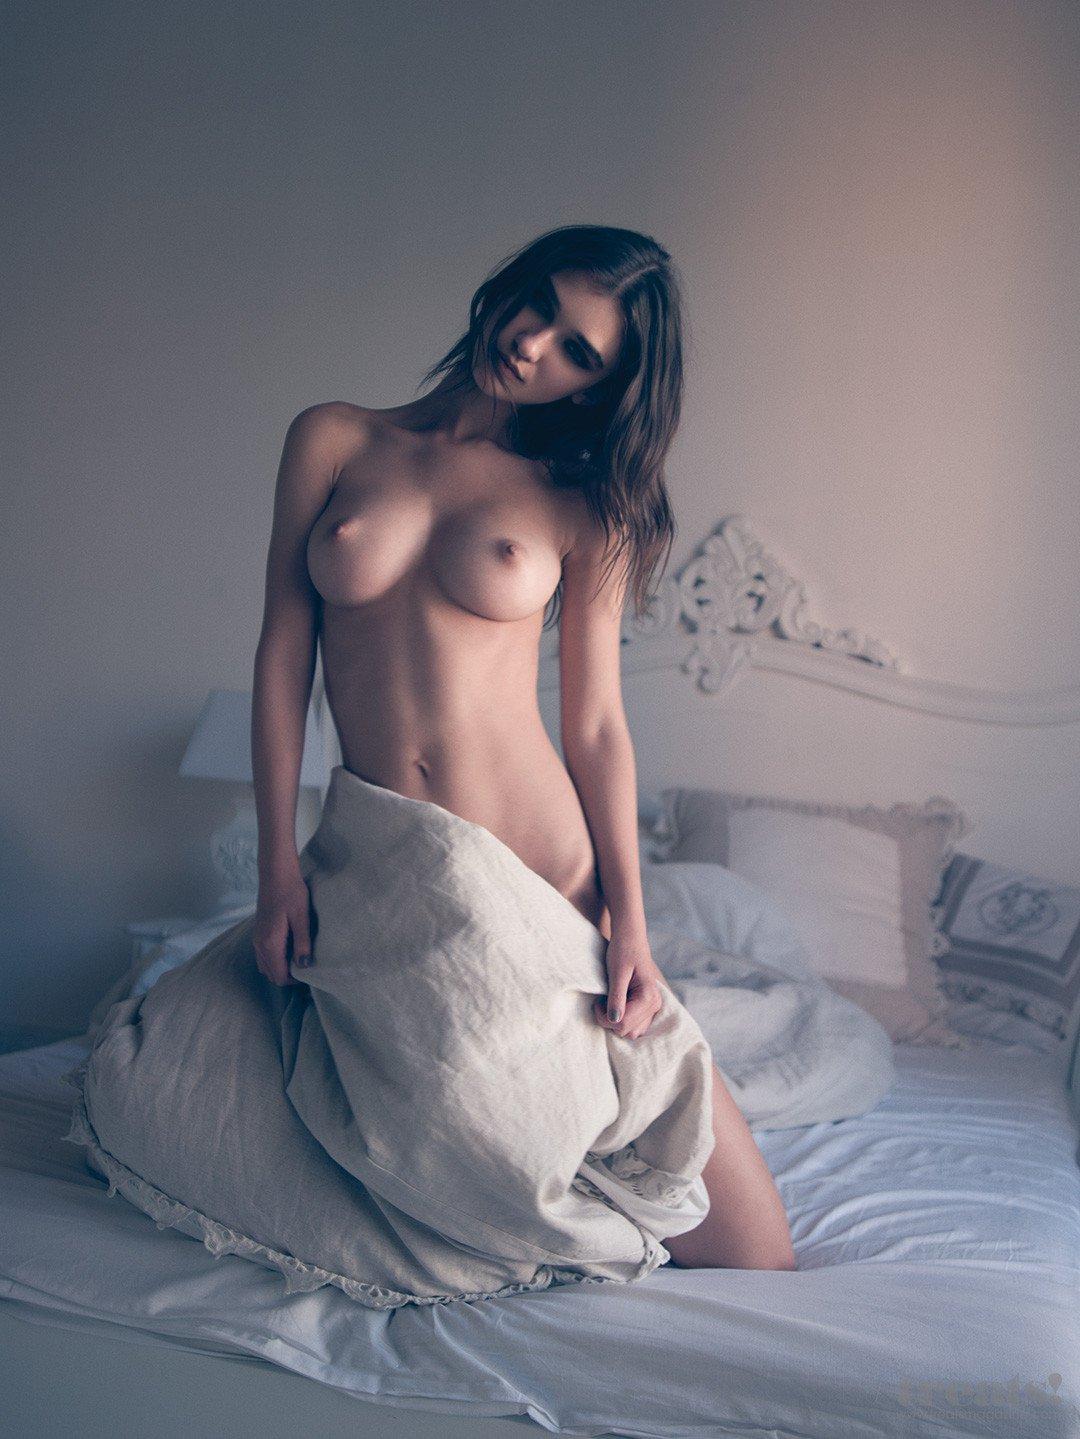 Nude paula bulczynska Paula Bulczynska